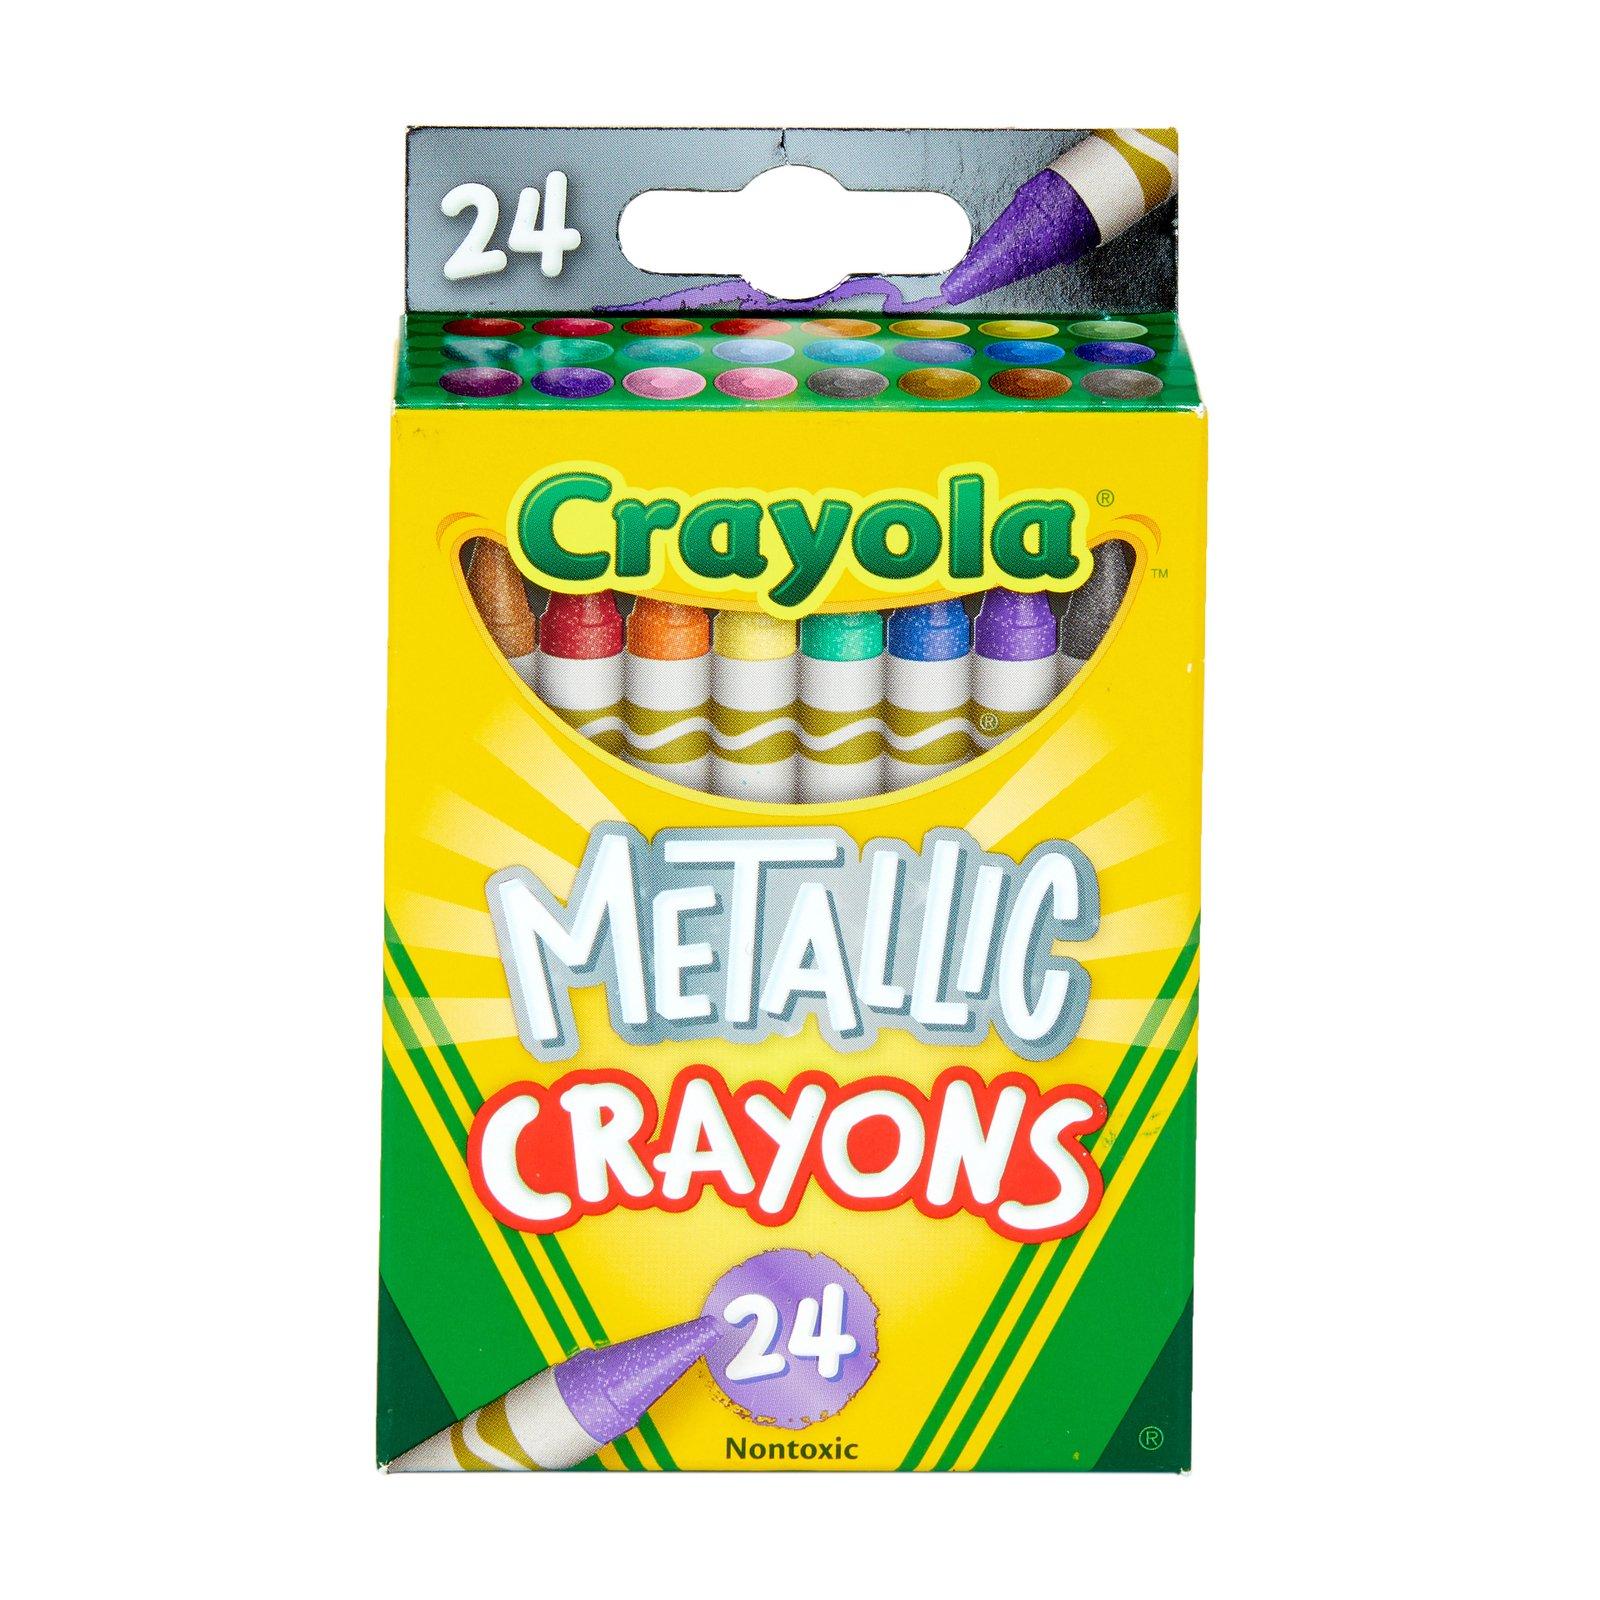 Crayola Metallic Crayons